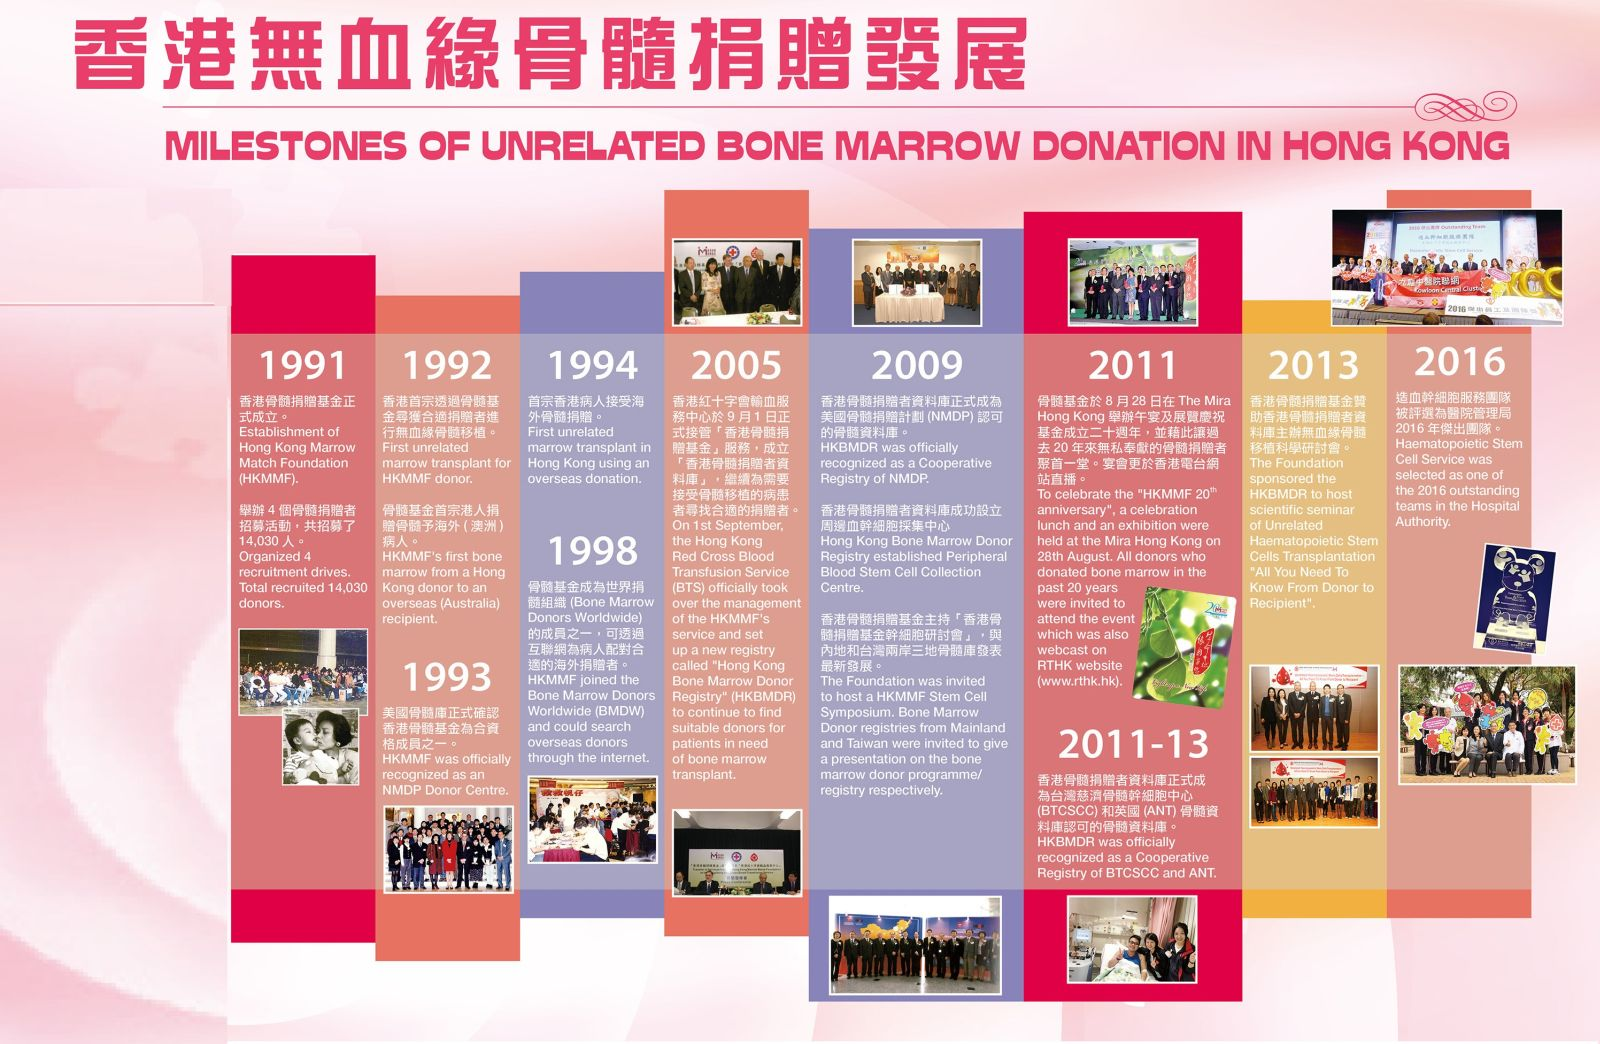 Image: Milestones of unrelated Bone Marrow Donation in Hong Kong